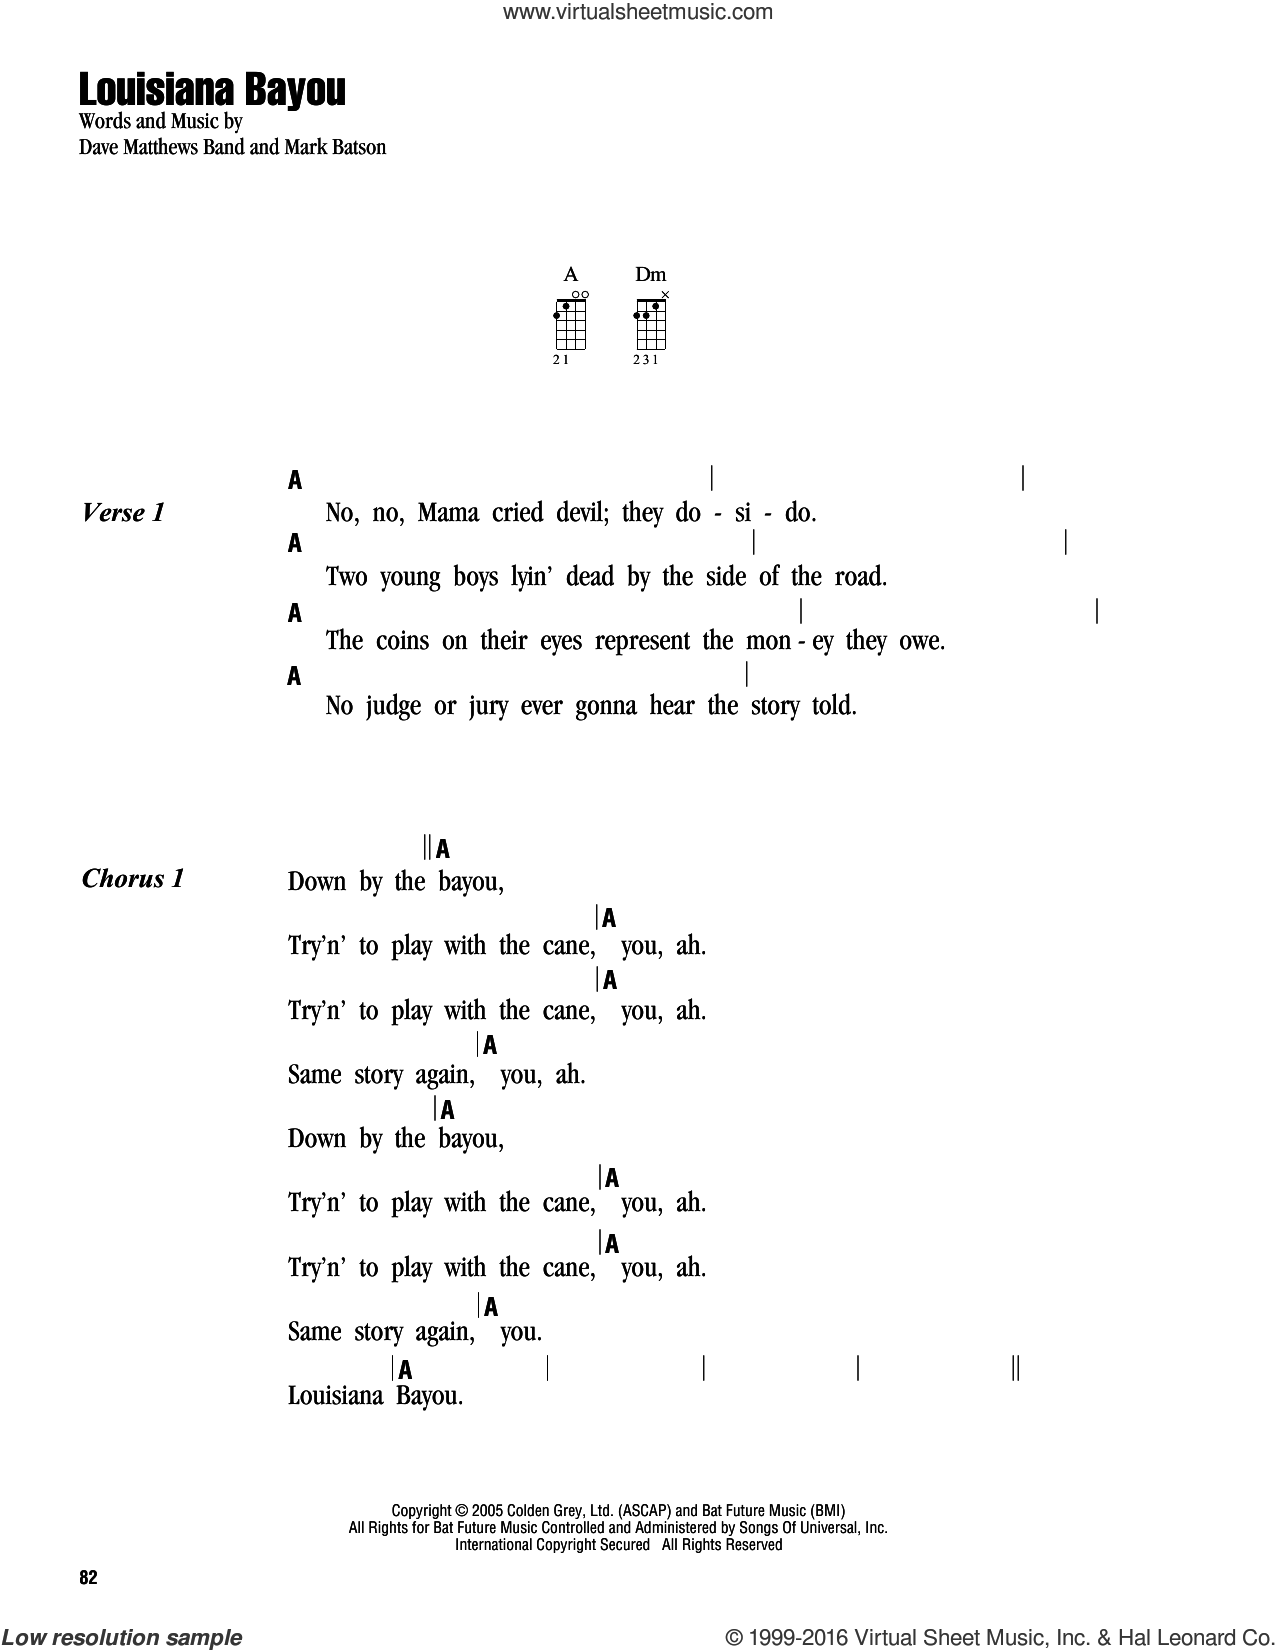 Louisiana Bayou sheet music for ukulele (chords) by Dave Matthews Band and Mark Batson, intermediate skill level